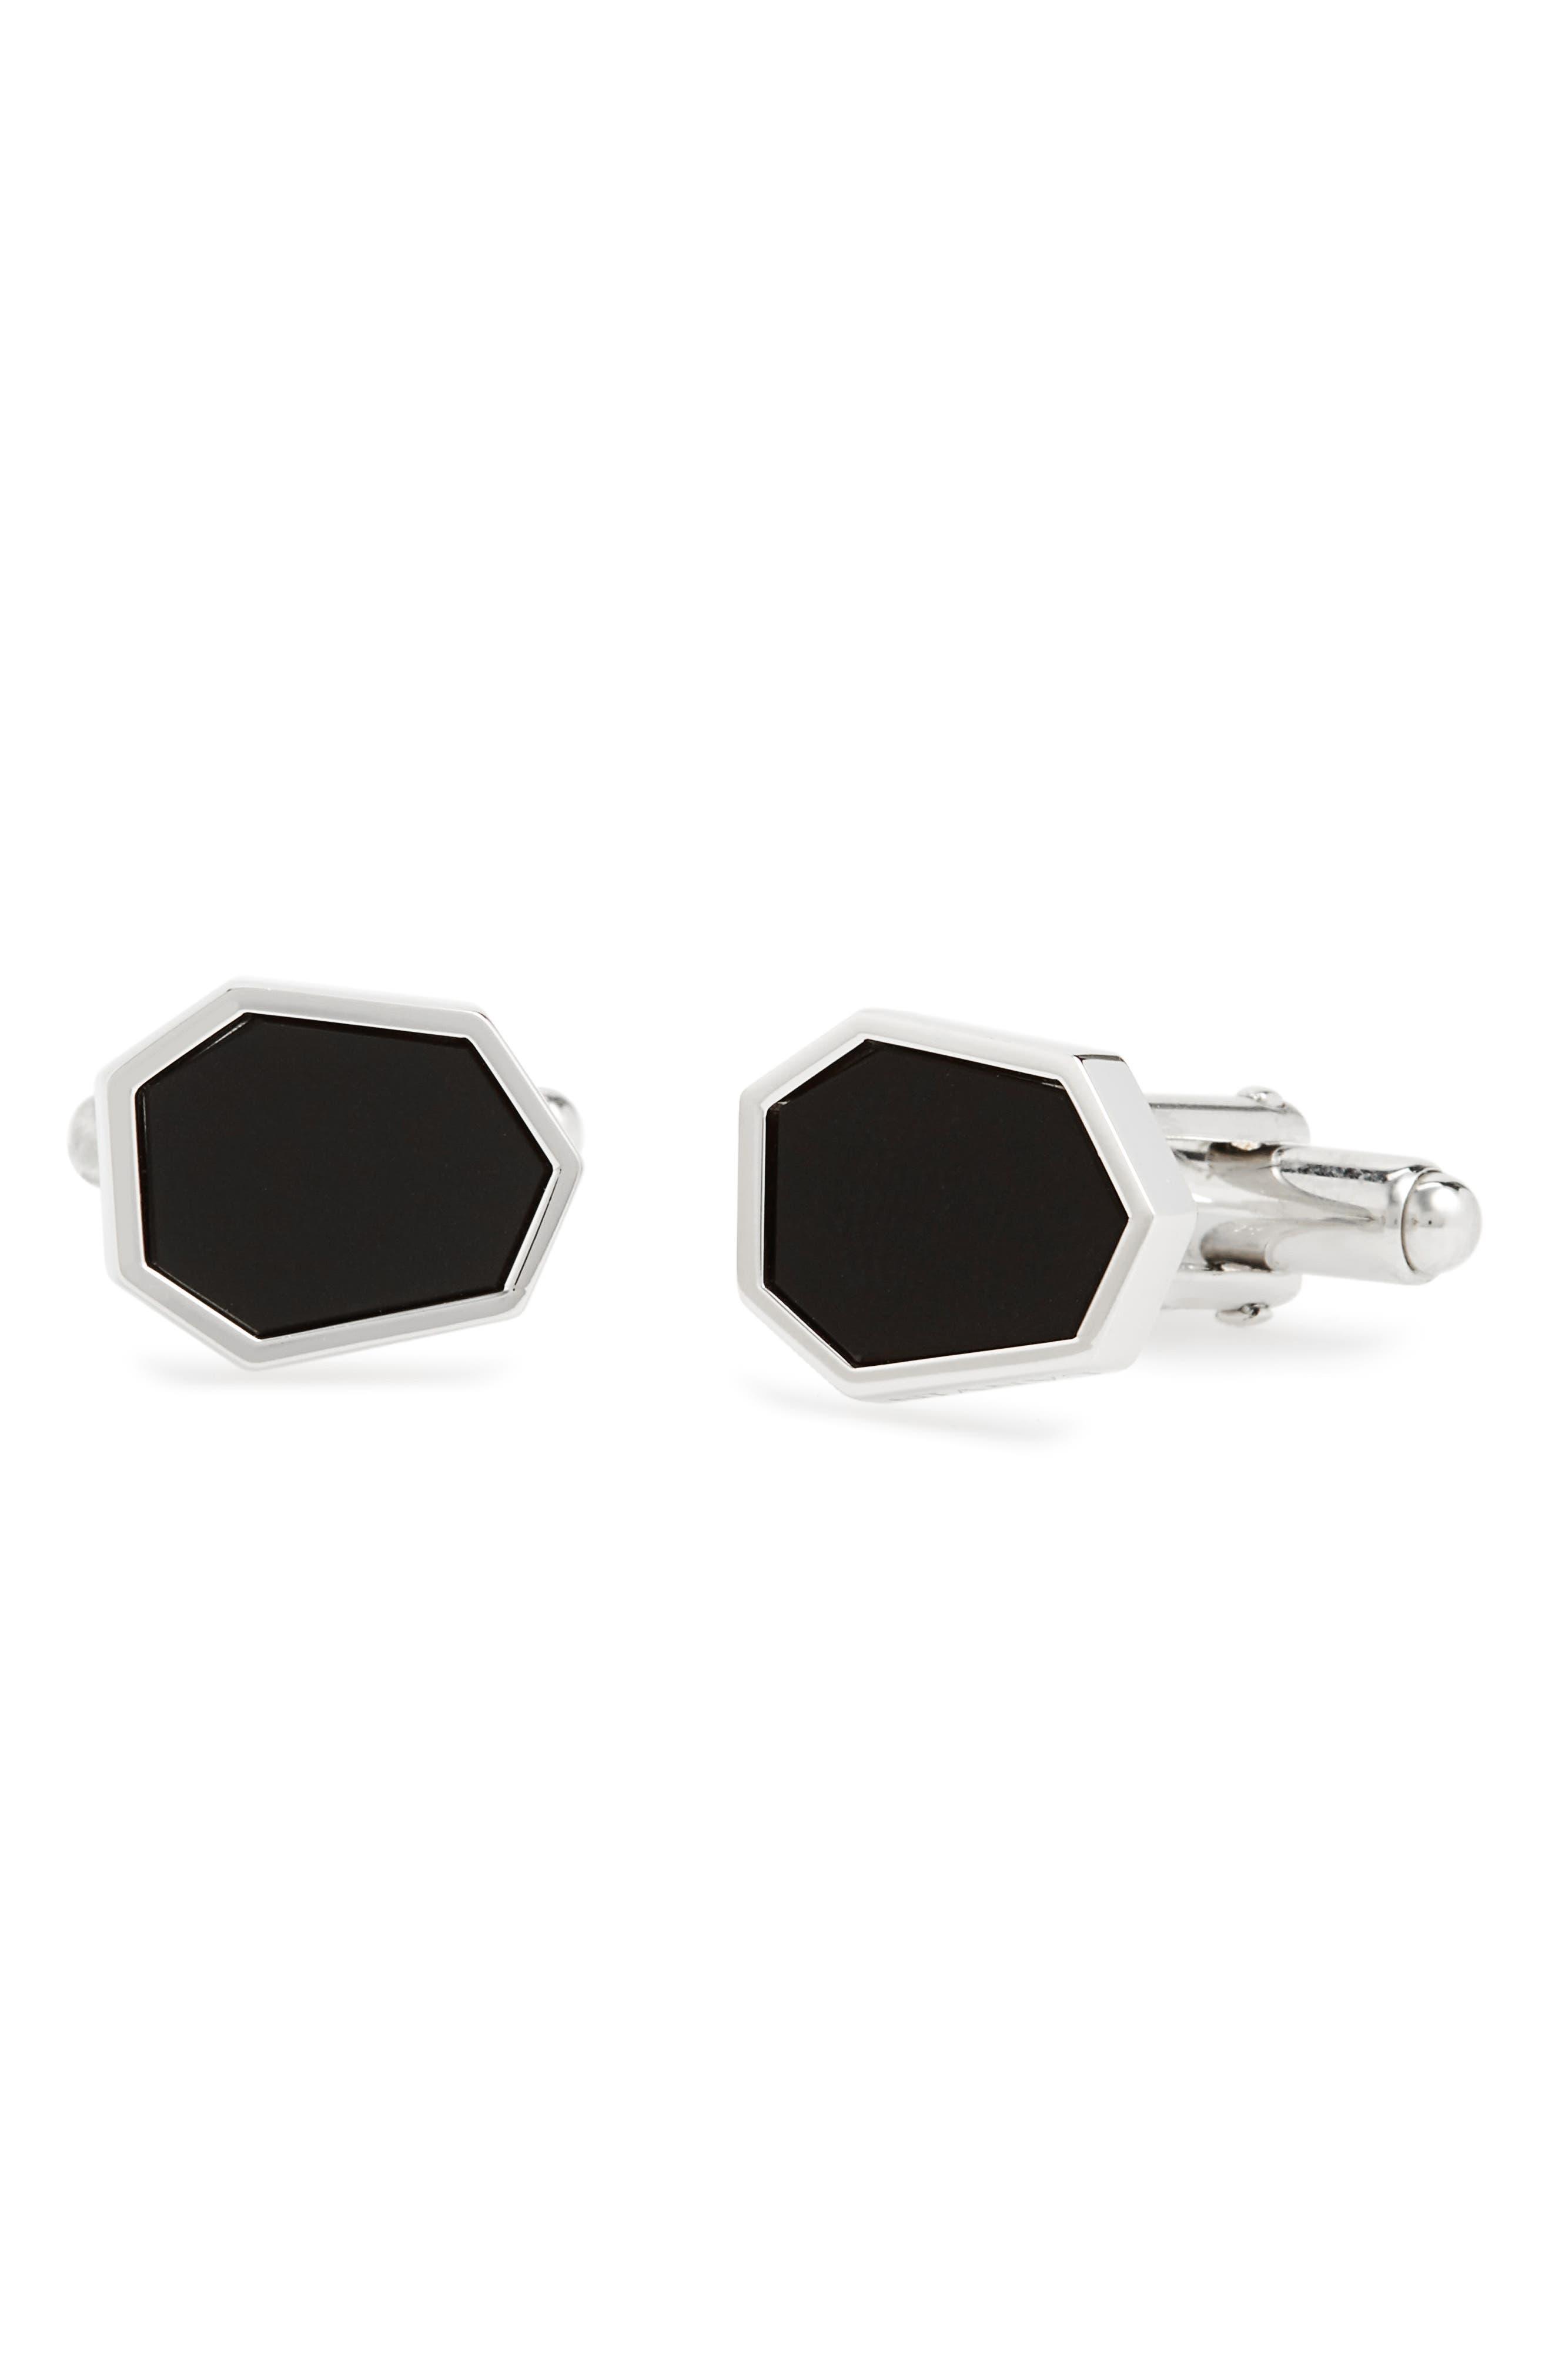 Polygon Onyx Cuff Links,                         Main,                         color, 040